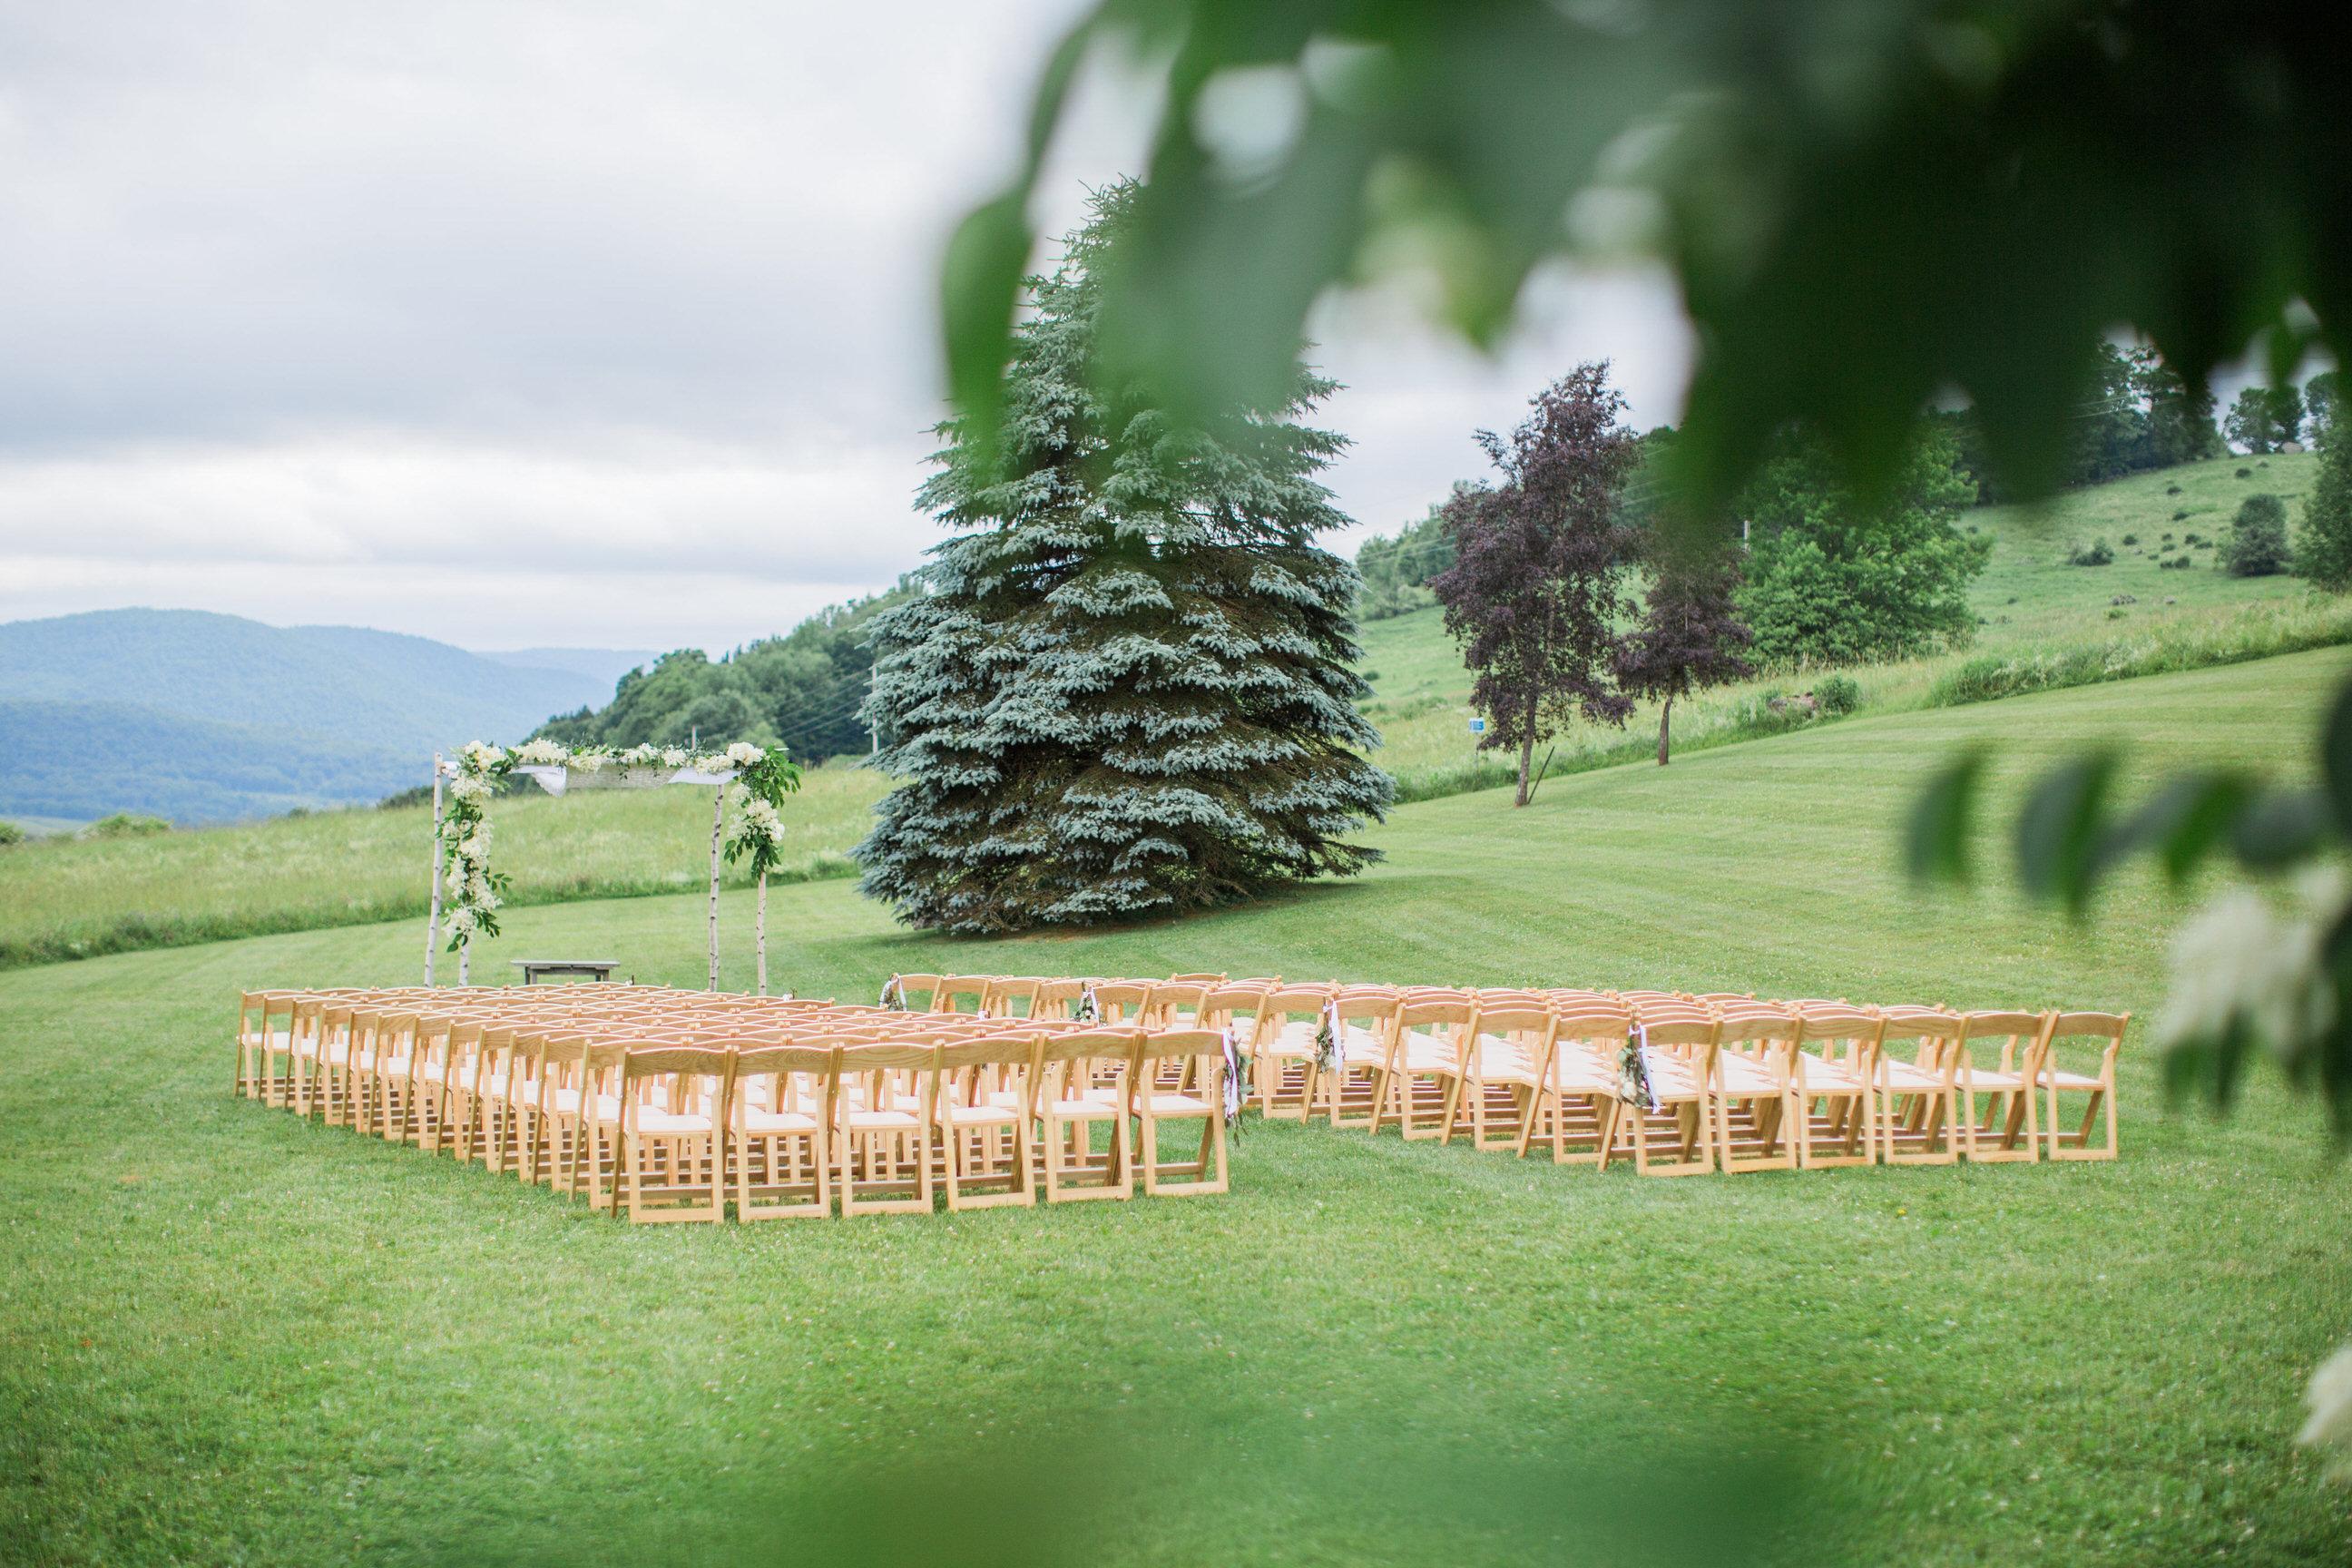 https://stonewallestate.com/wp-content/uploads/2019/02/mountain-top-wedding-view-1.jpg